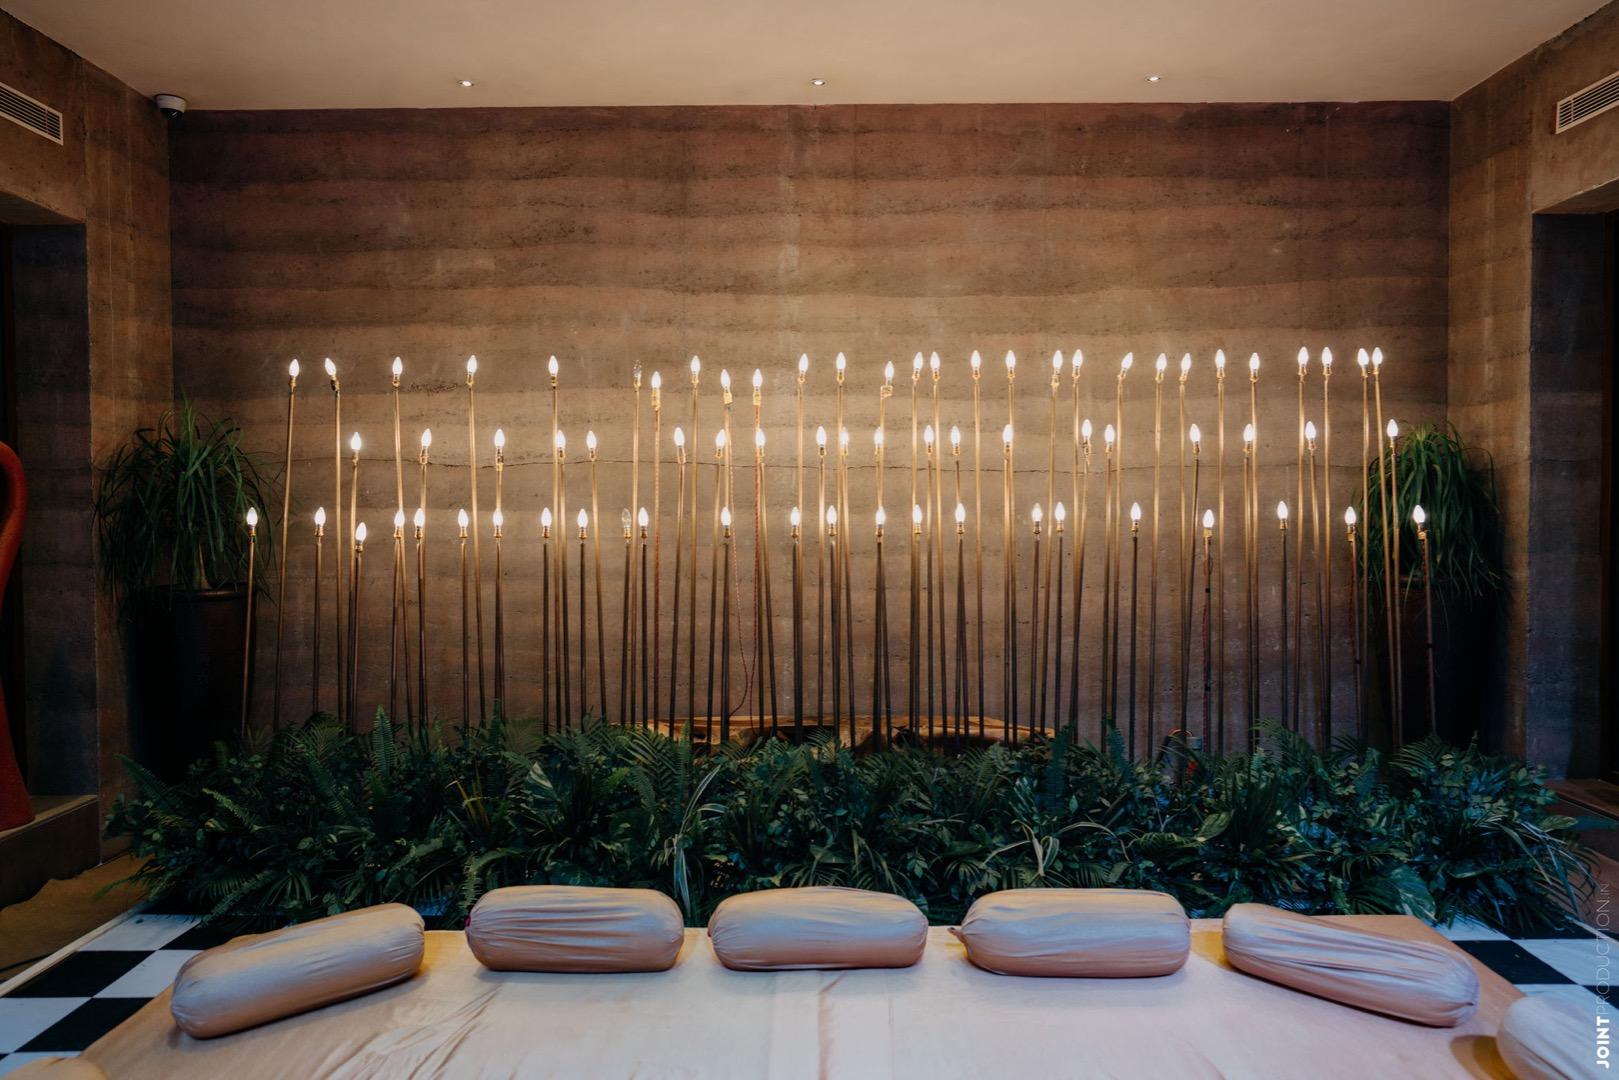 stunning candle lit decor